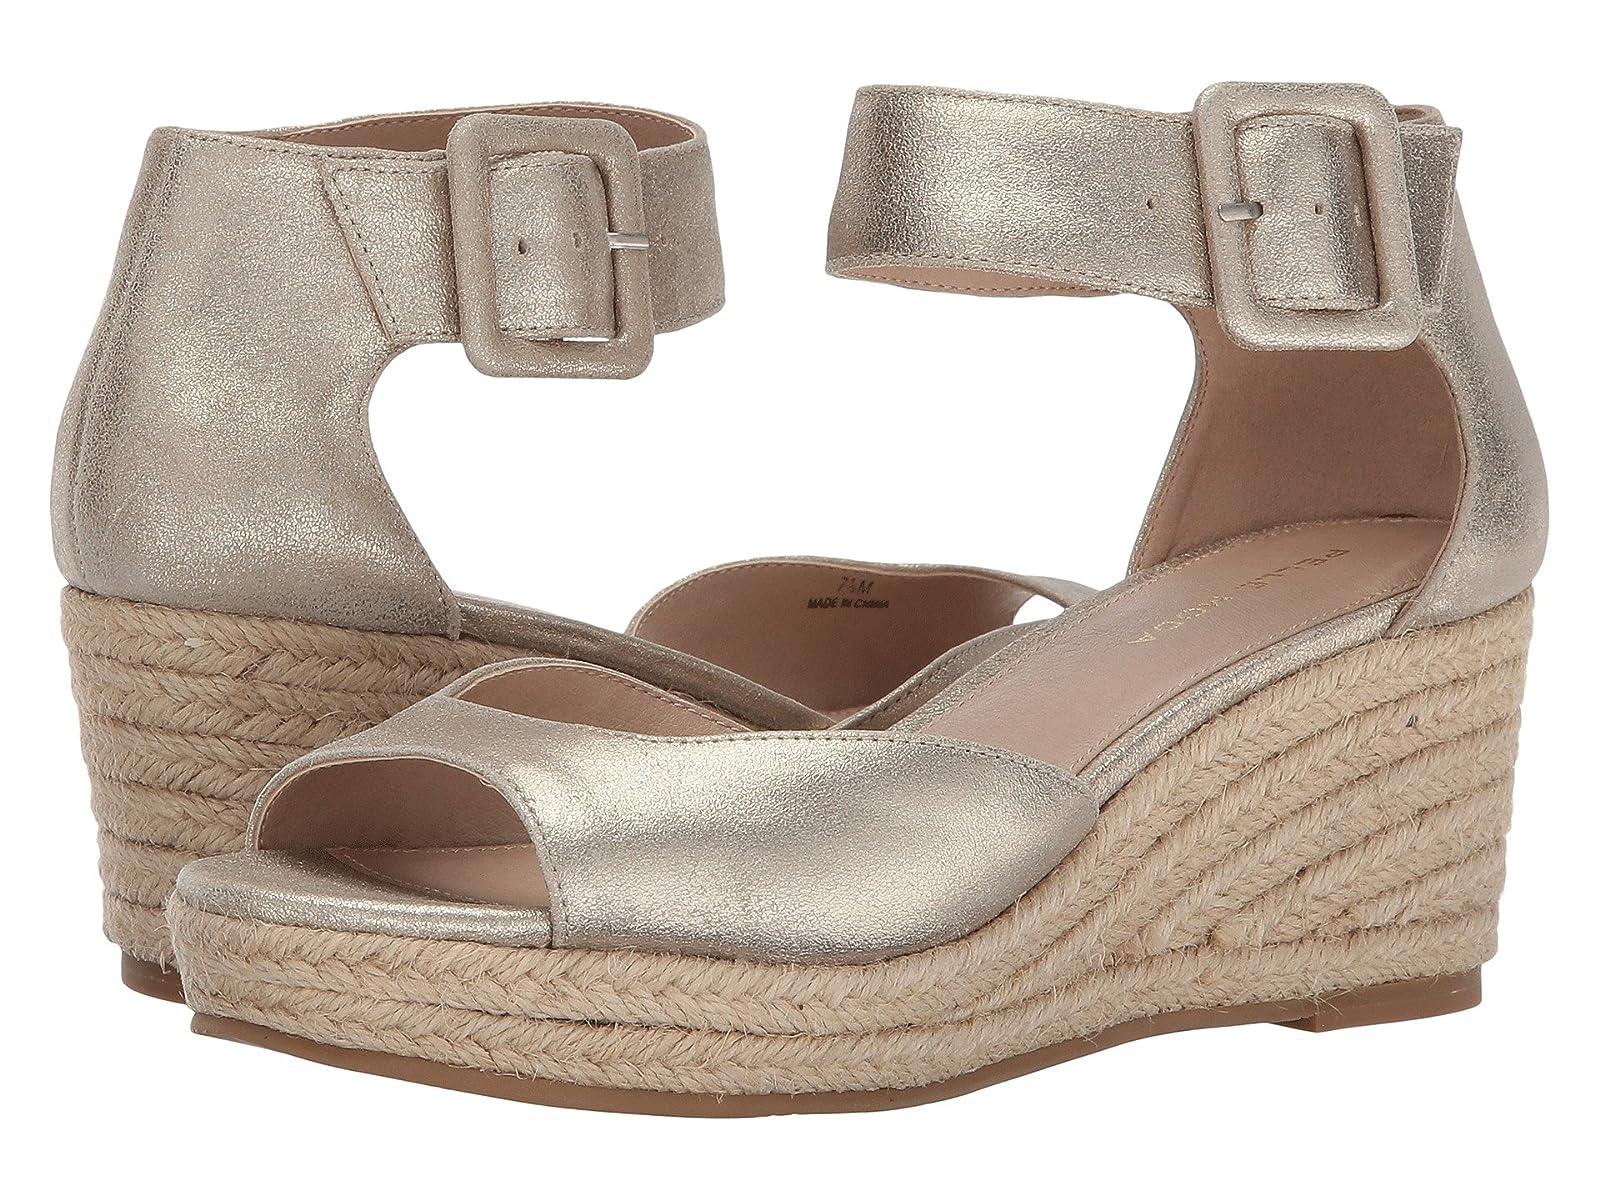 Pelle Moda KauaiCheap and distinctive eye-catching shoes